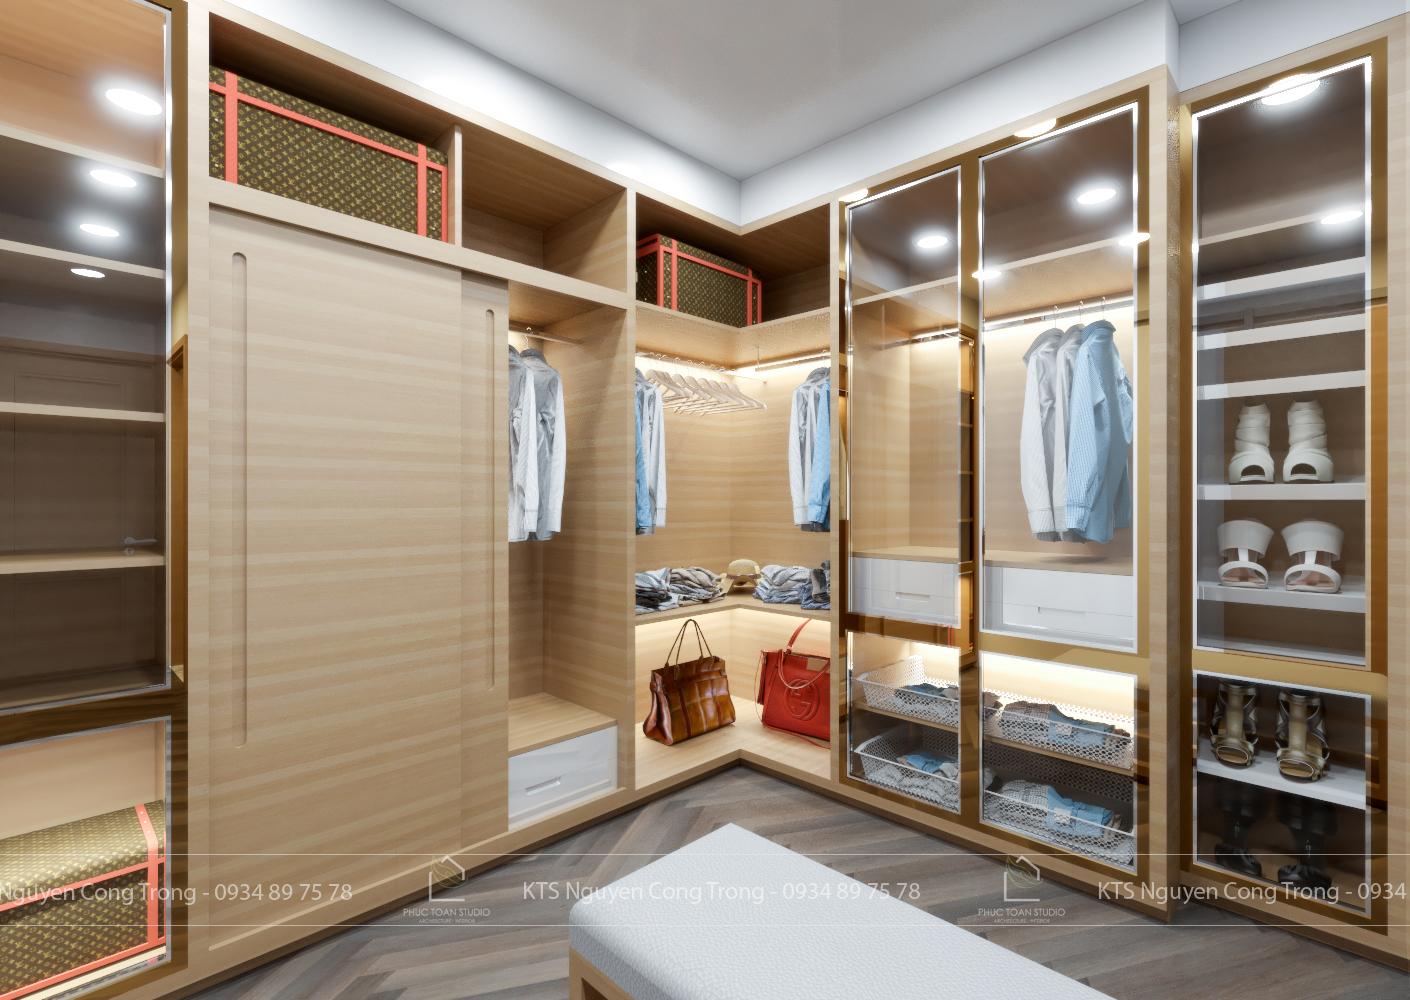 thiet-ke-noi-that-chung-cu-gather-apartment131